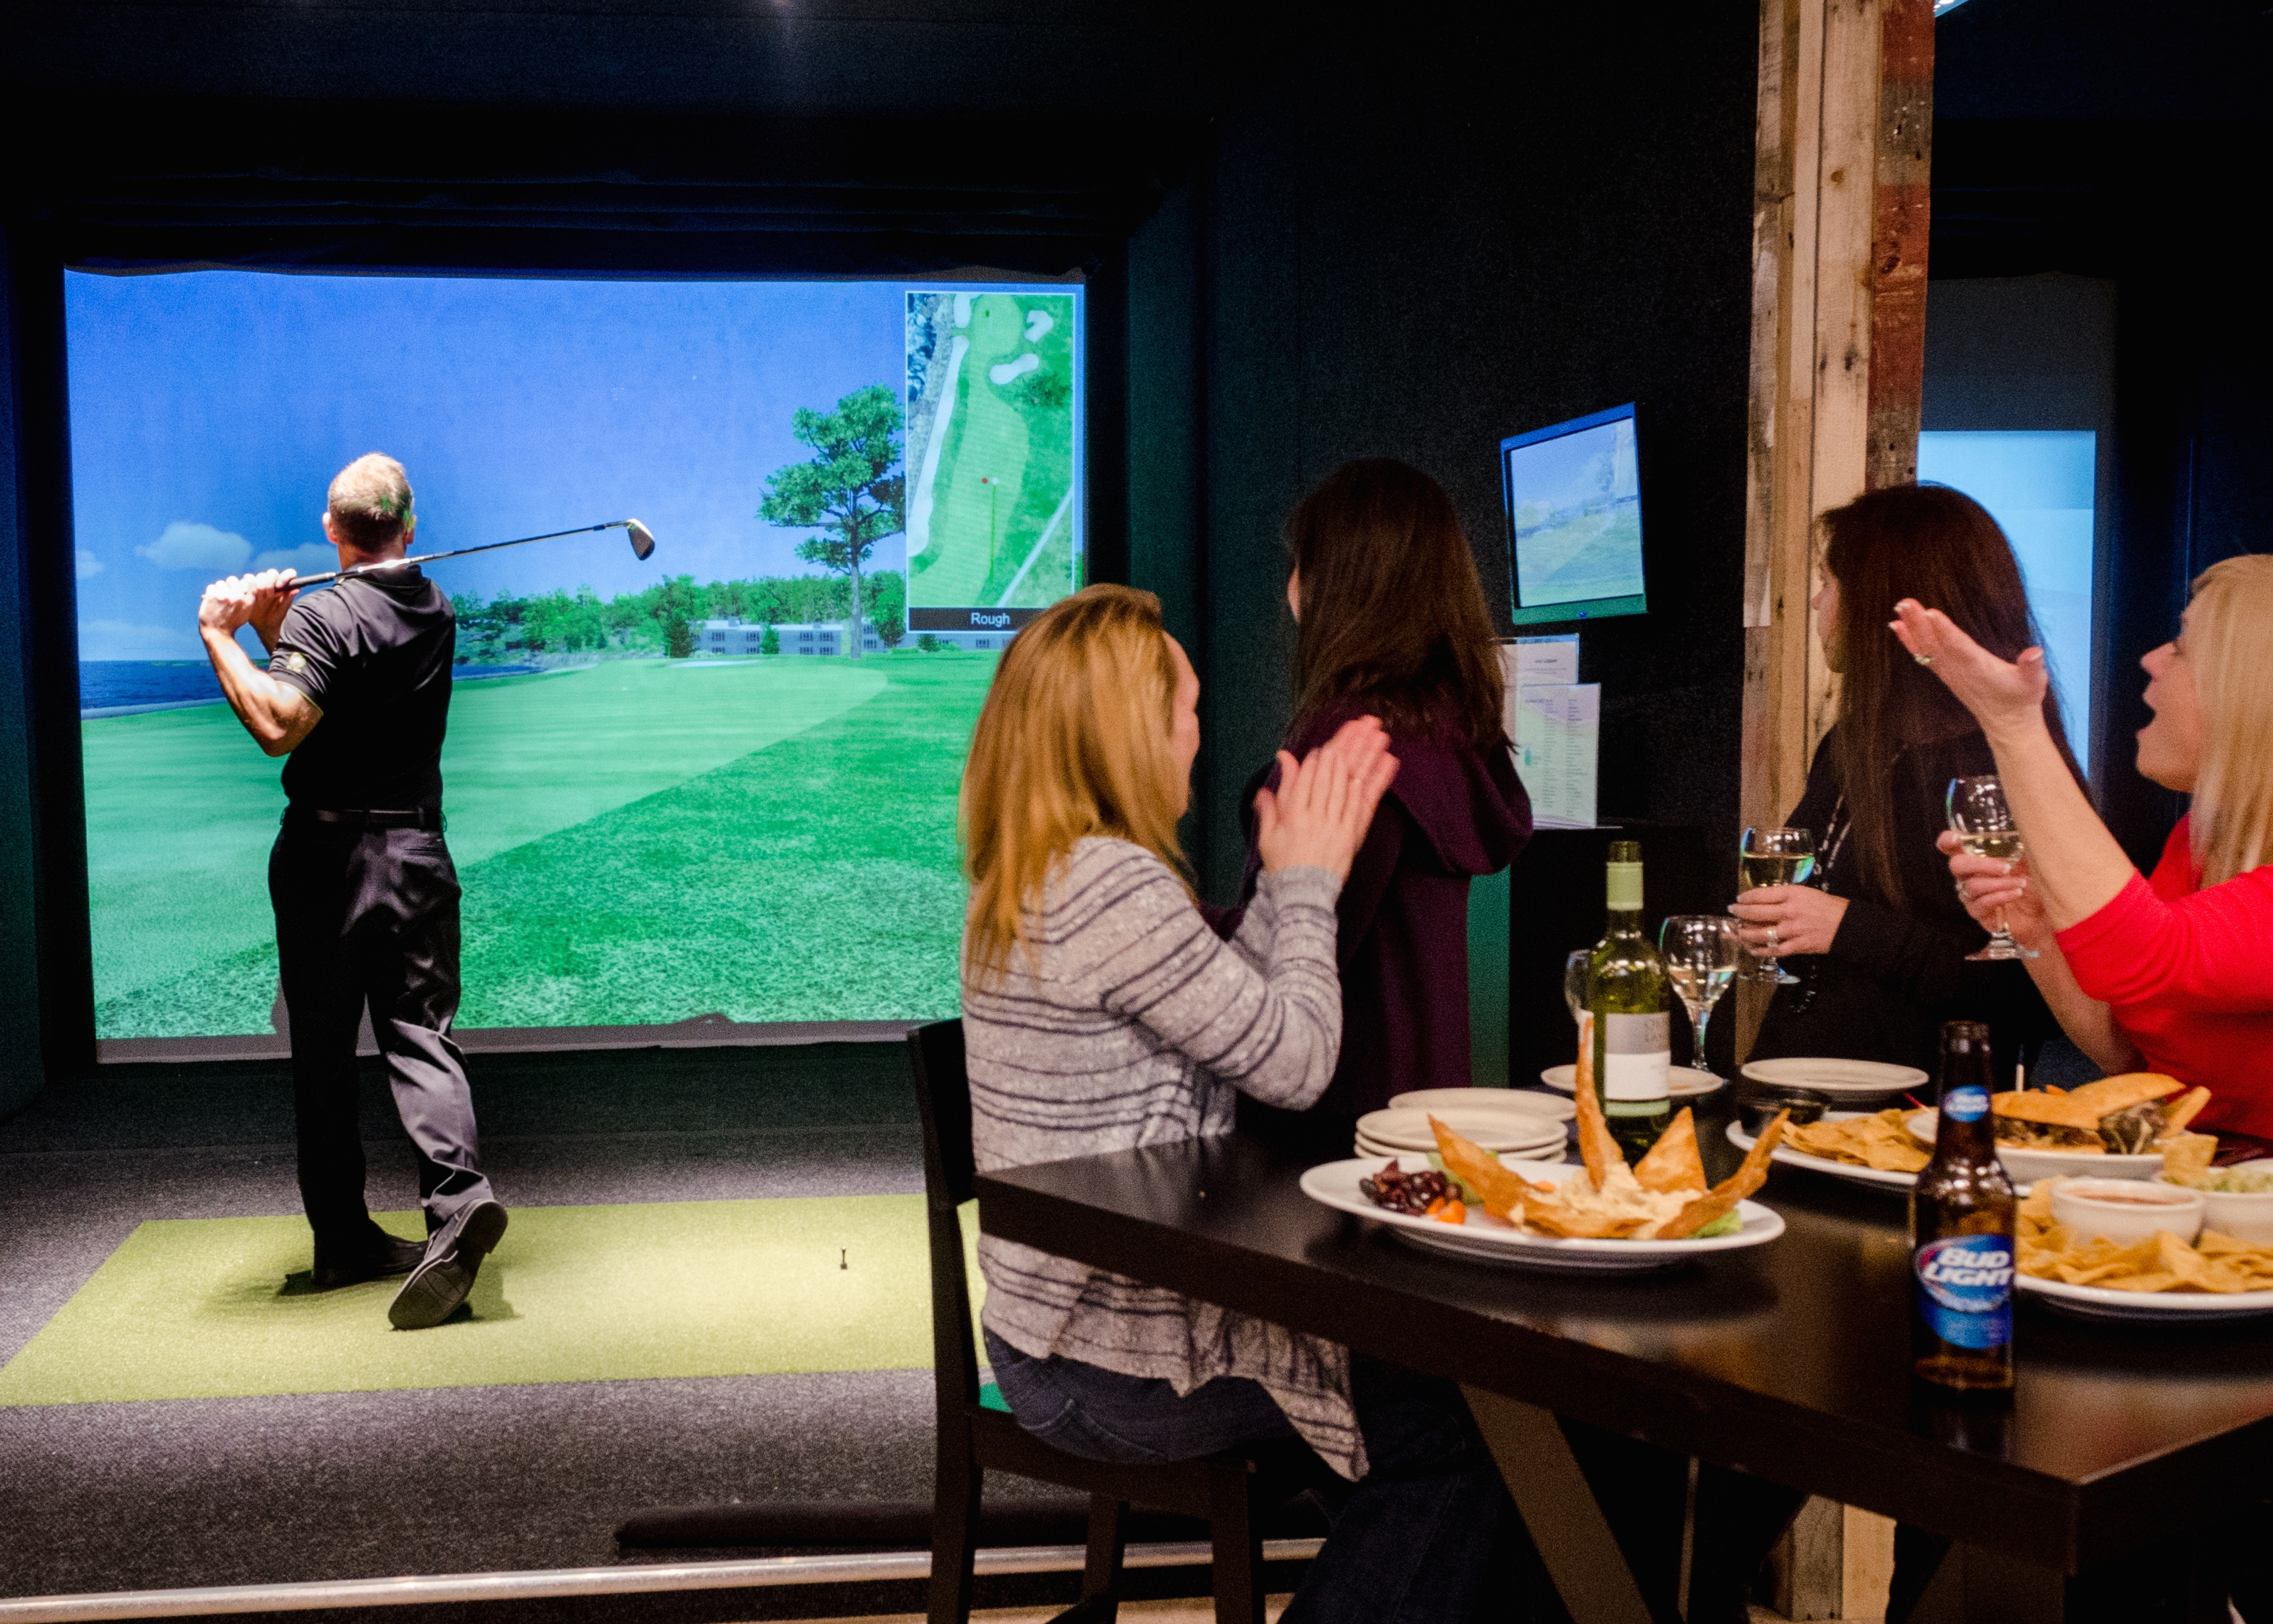 Halfway-House-indoor-golf-services-rates-picture.jpg